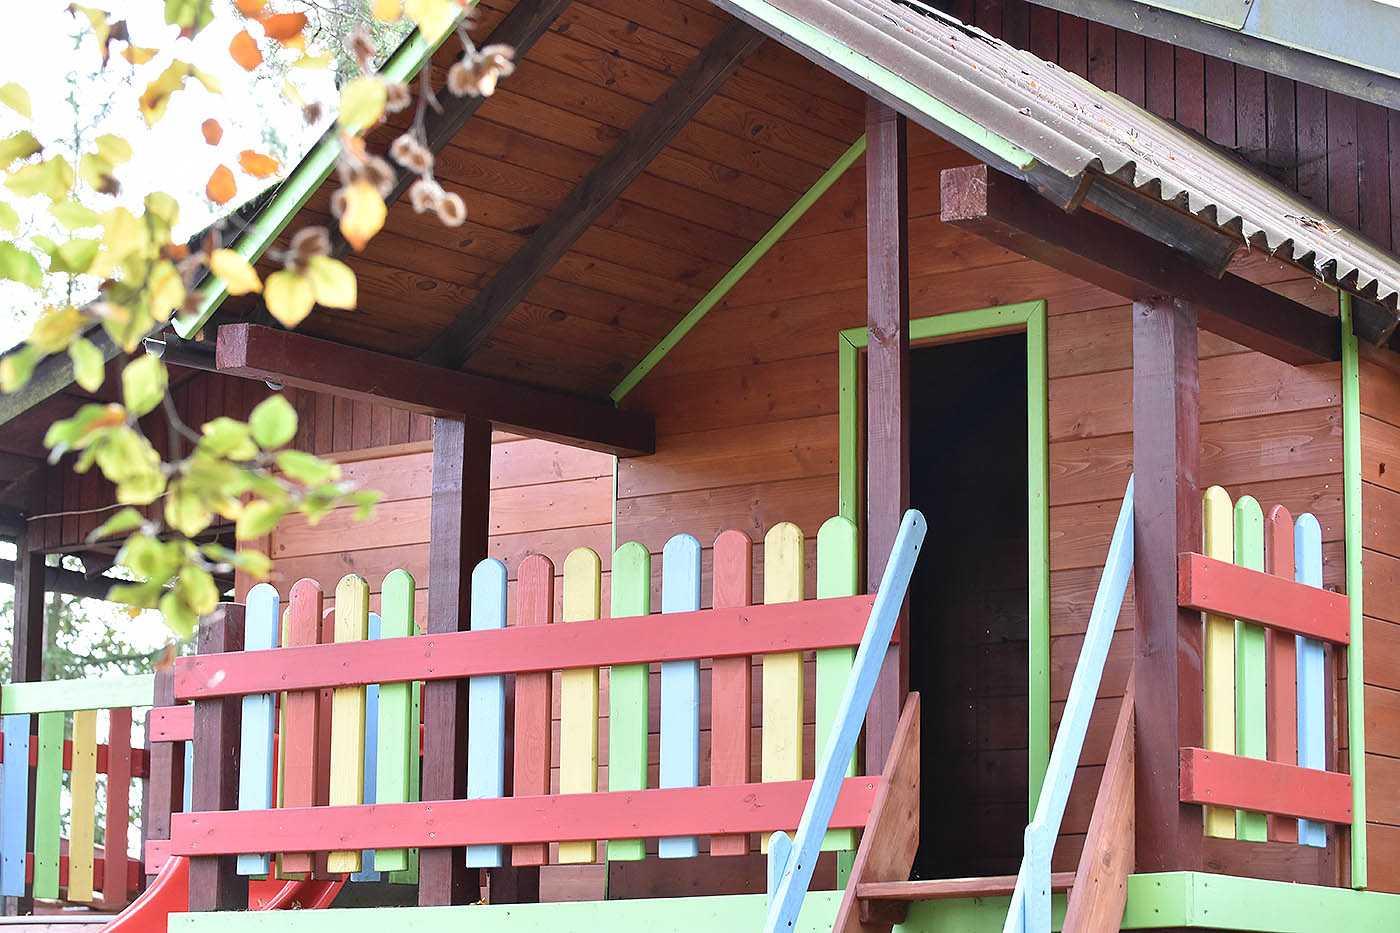 domki letniskowe kaszuby siedlisko bartek75